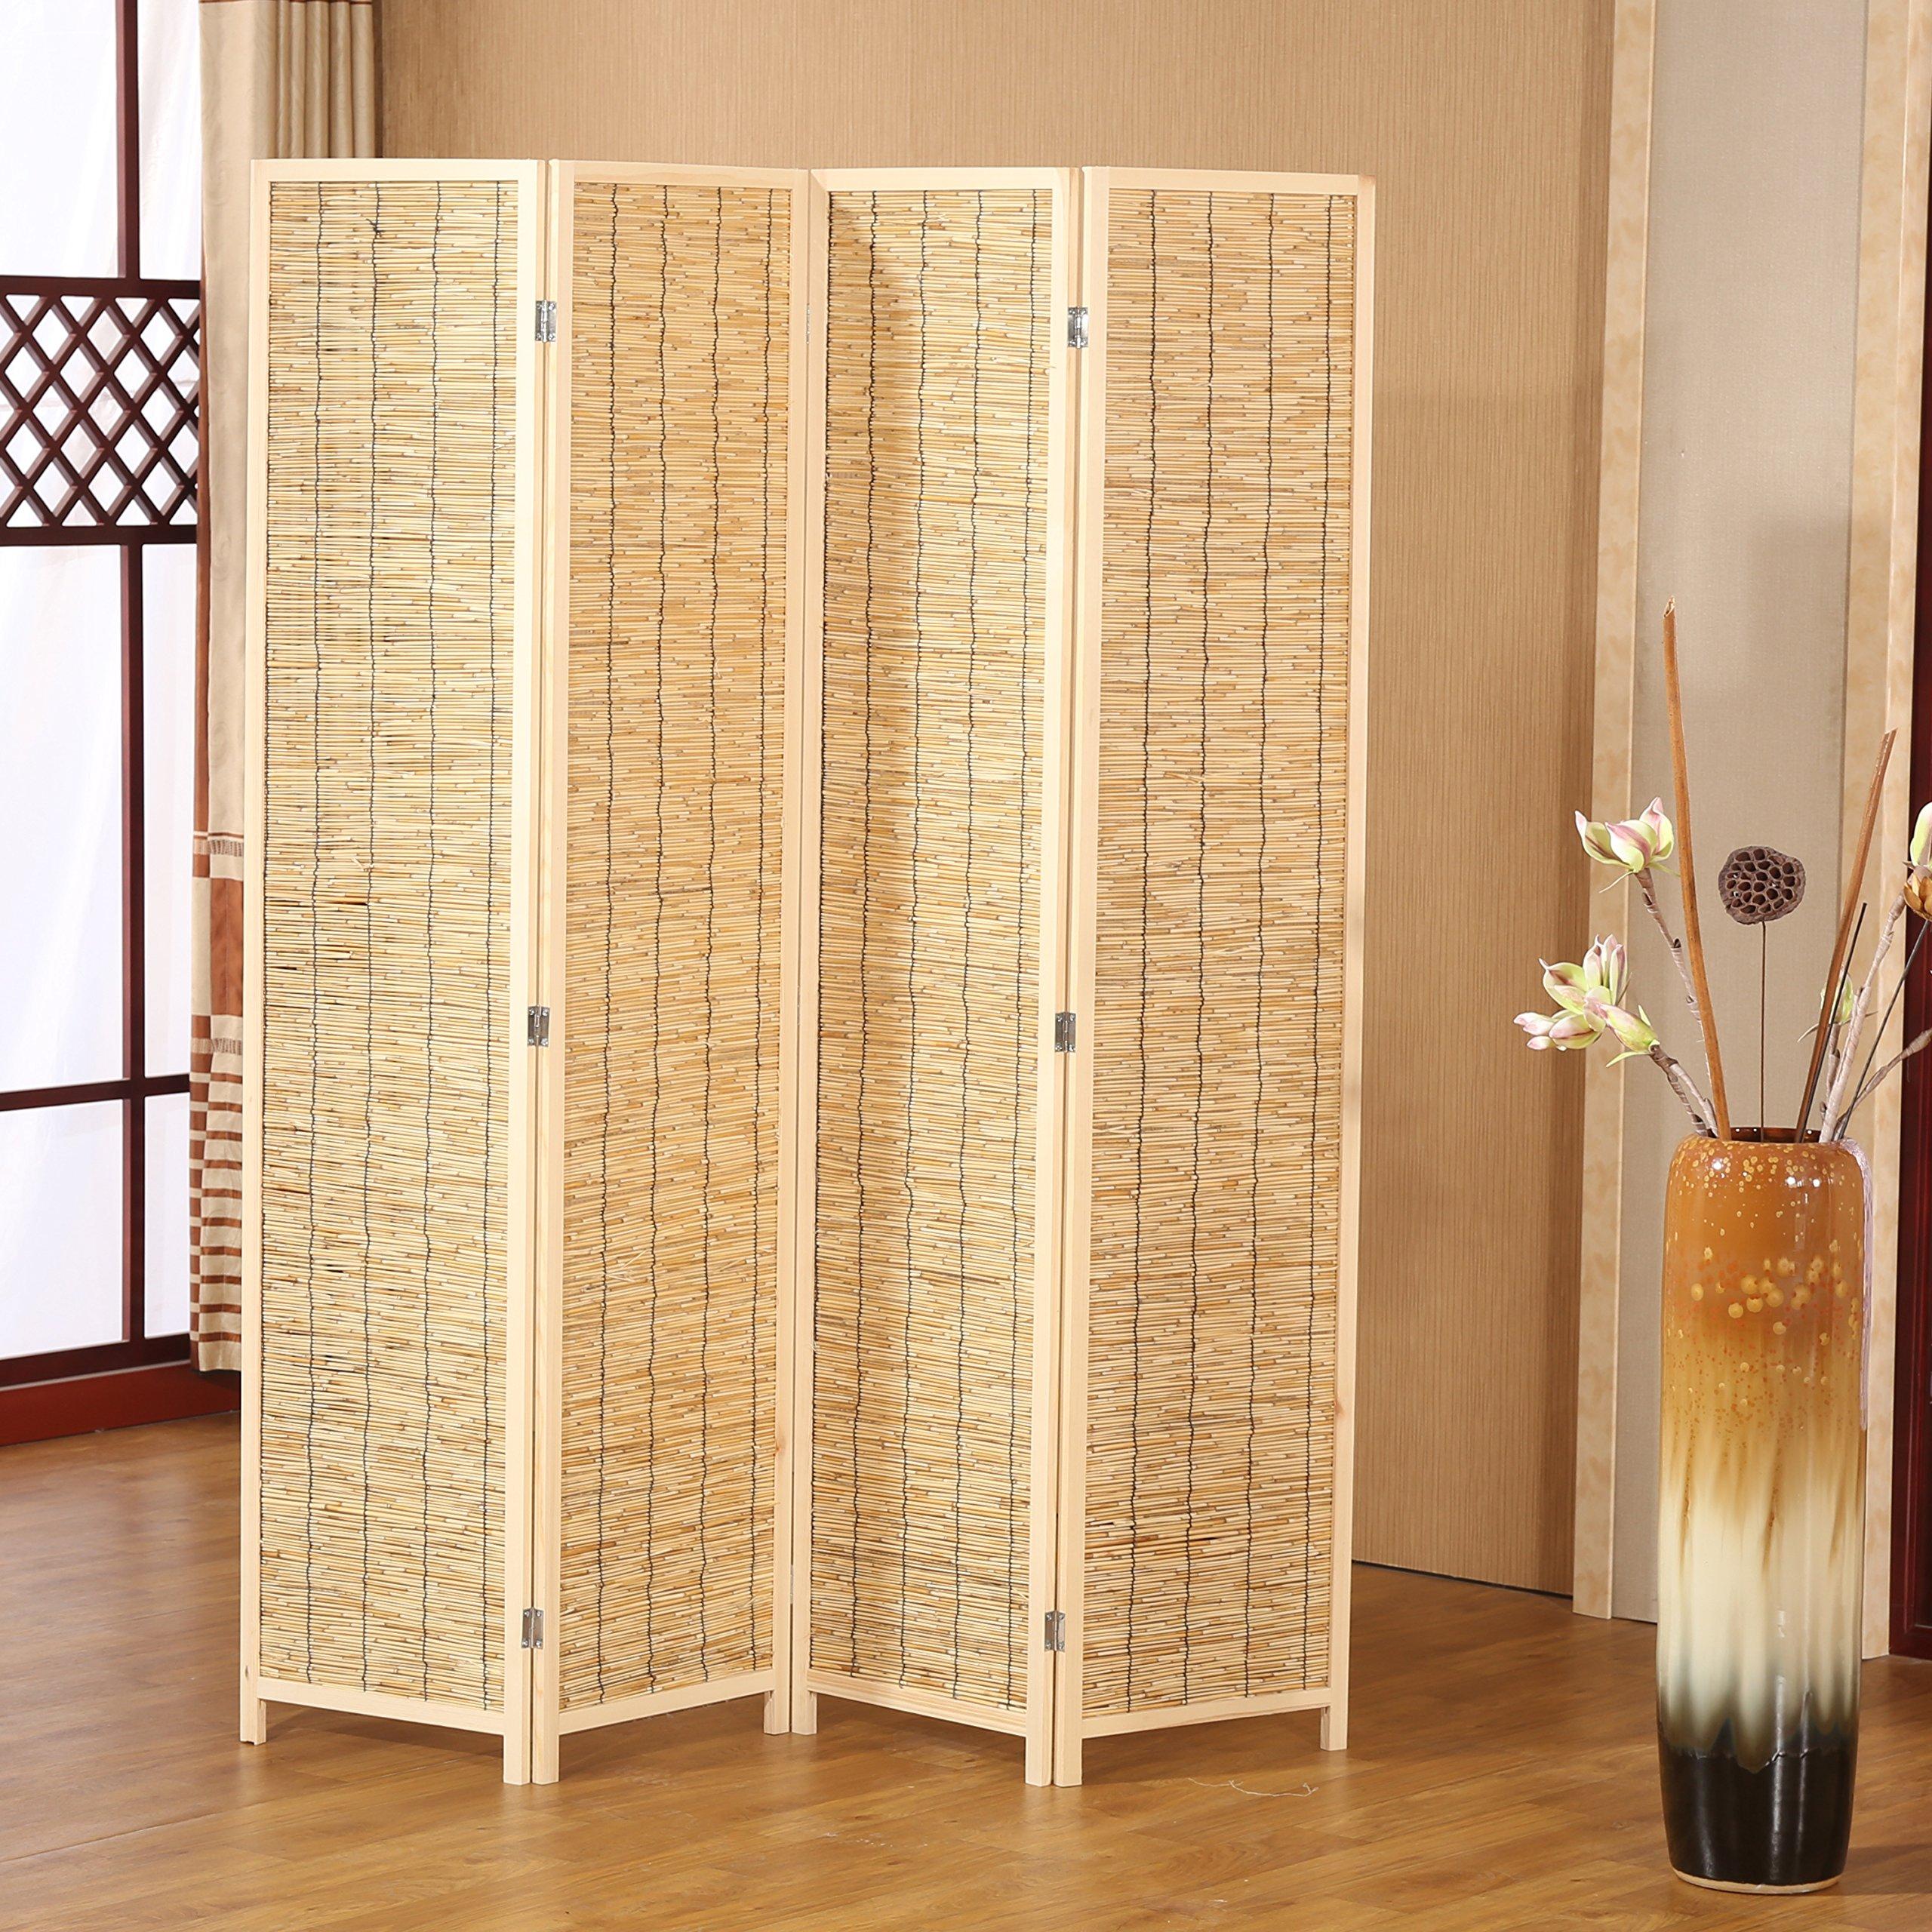 Decorative 4 Panel Wood & Bamboo Folding Room Divider Screen, Beige